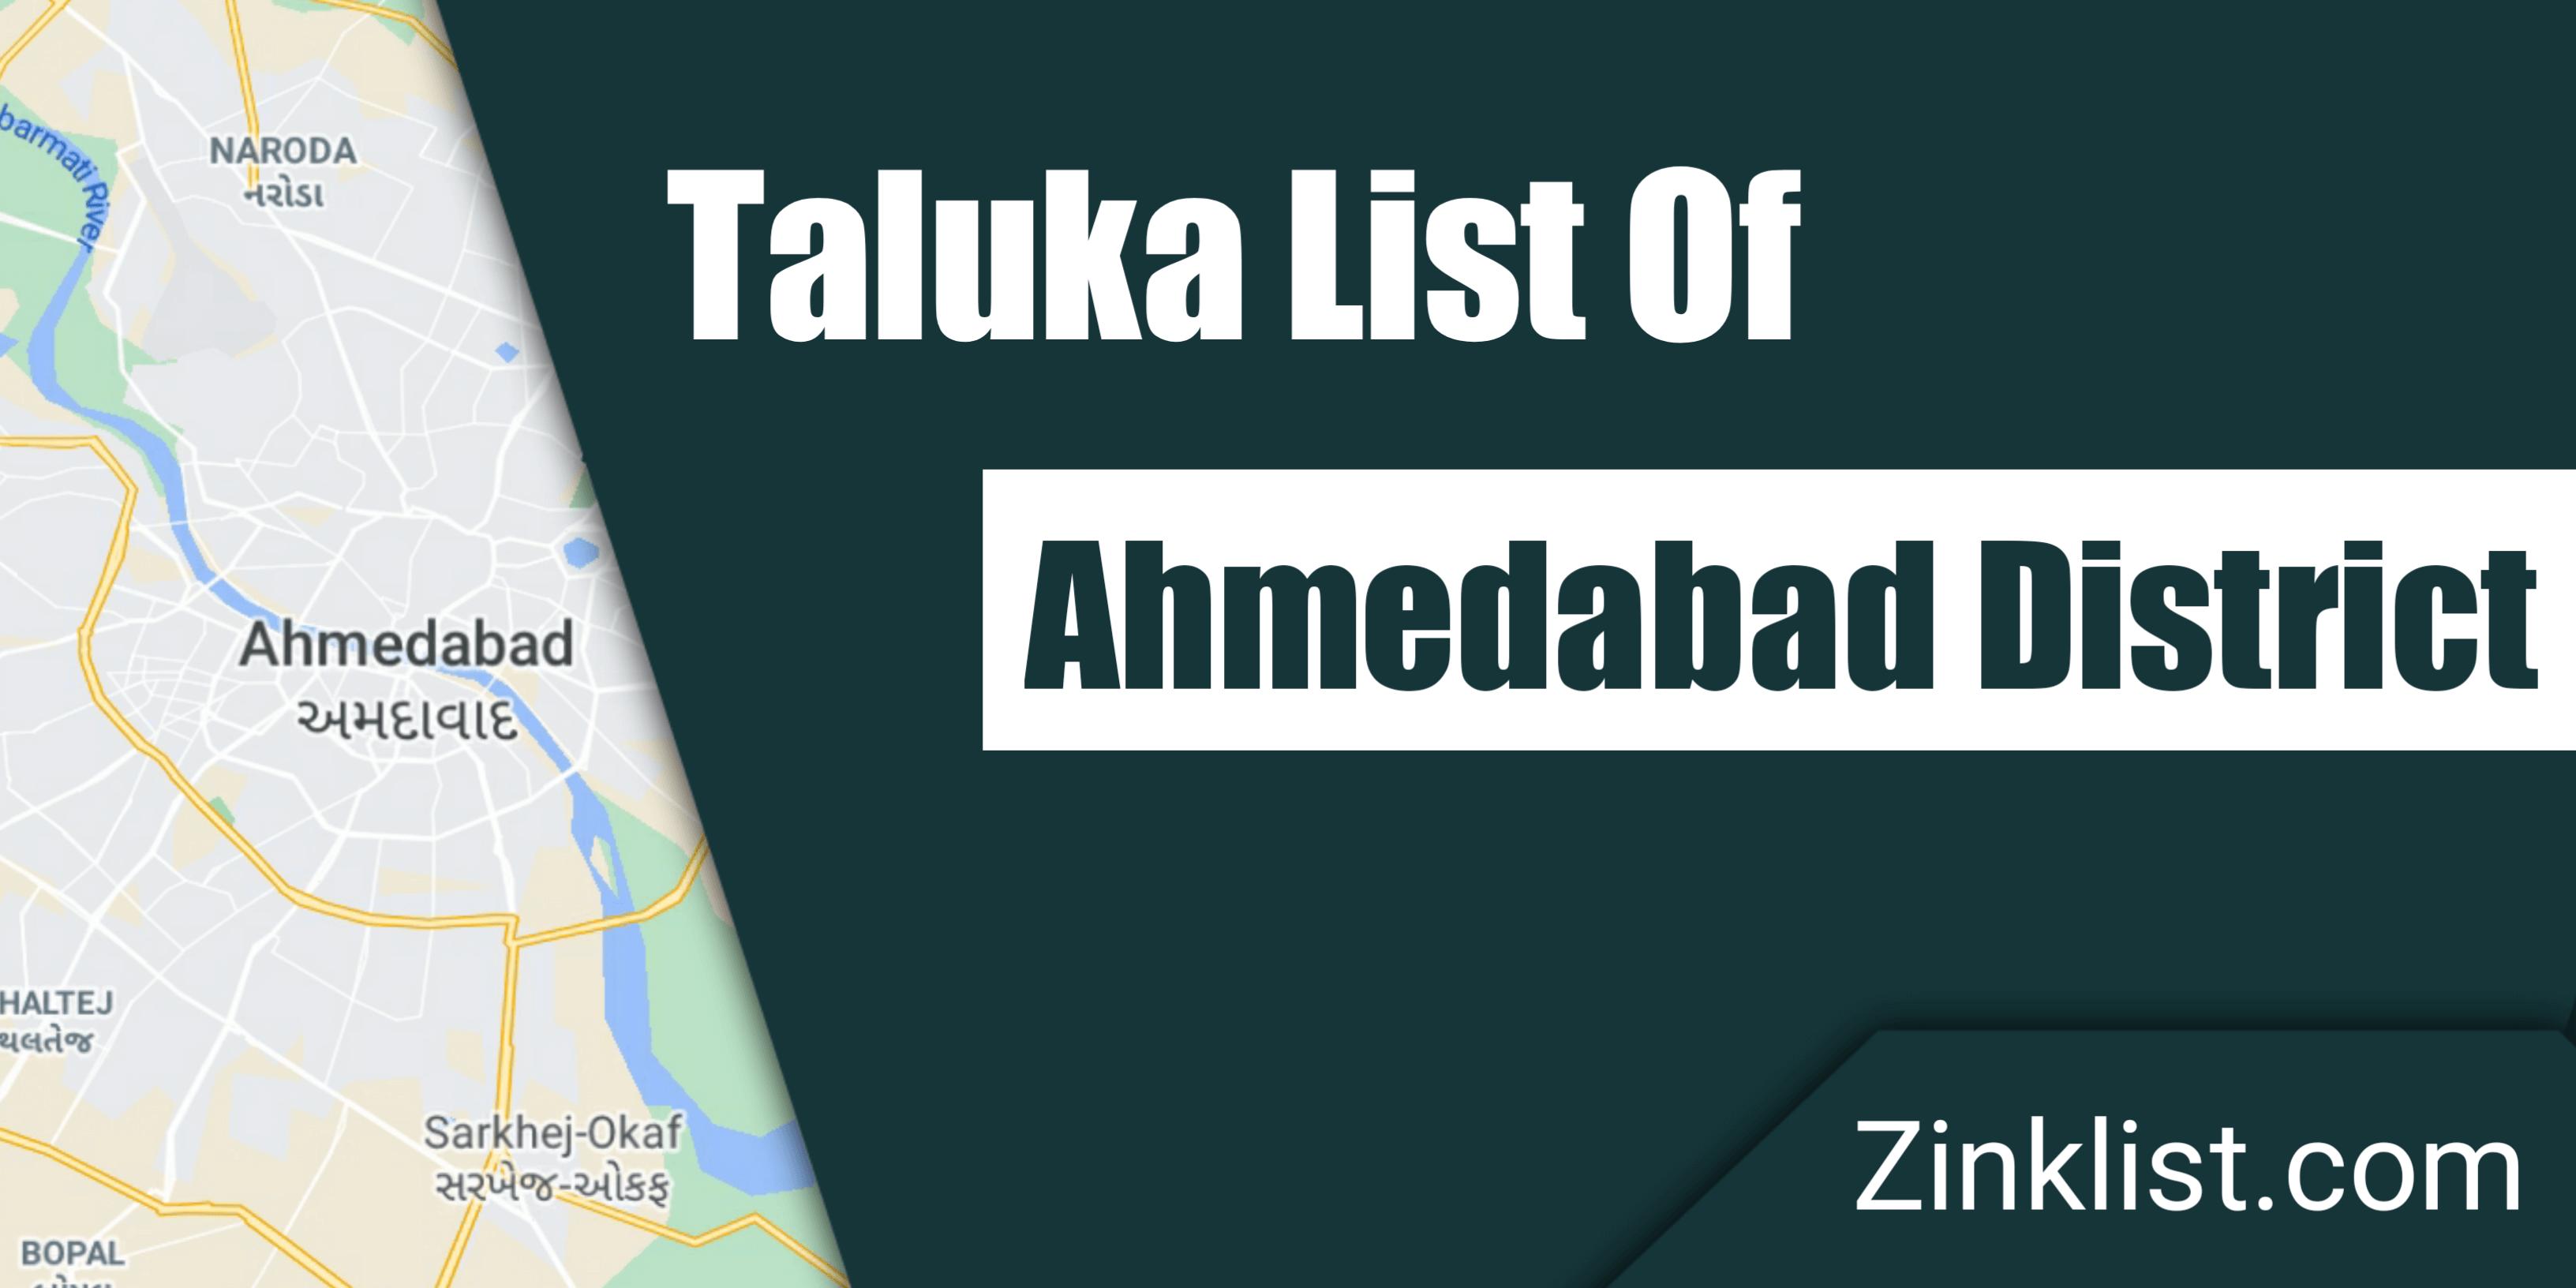 Taluka_List_of_Ahmedabad_Districts